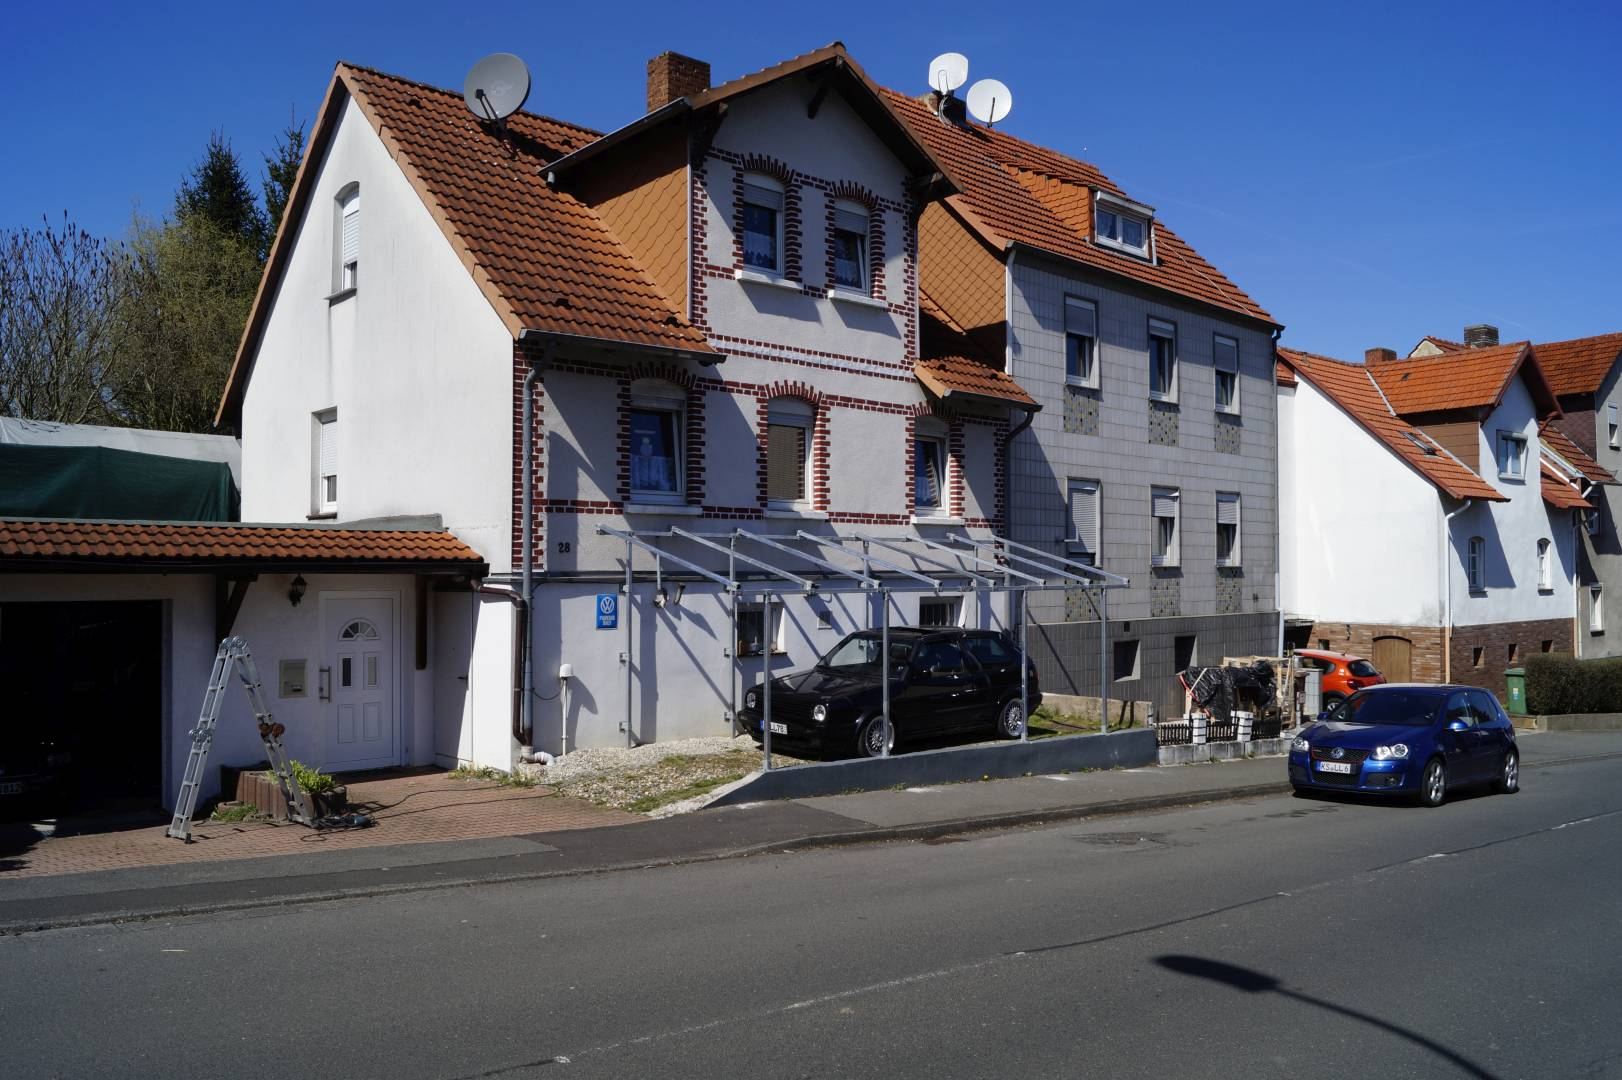 Carport_Aufbau_C05.jpg